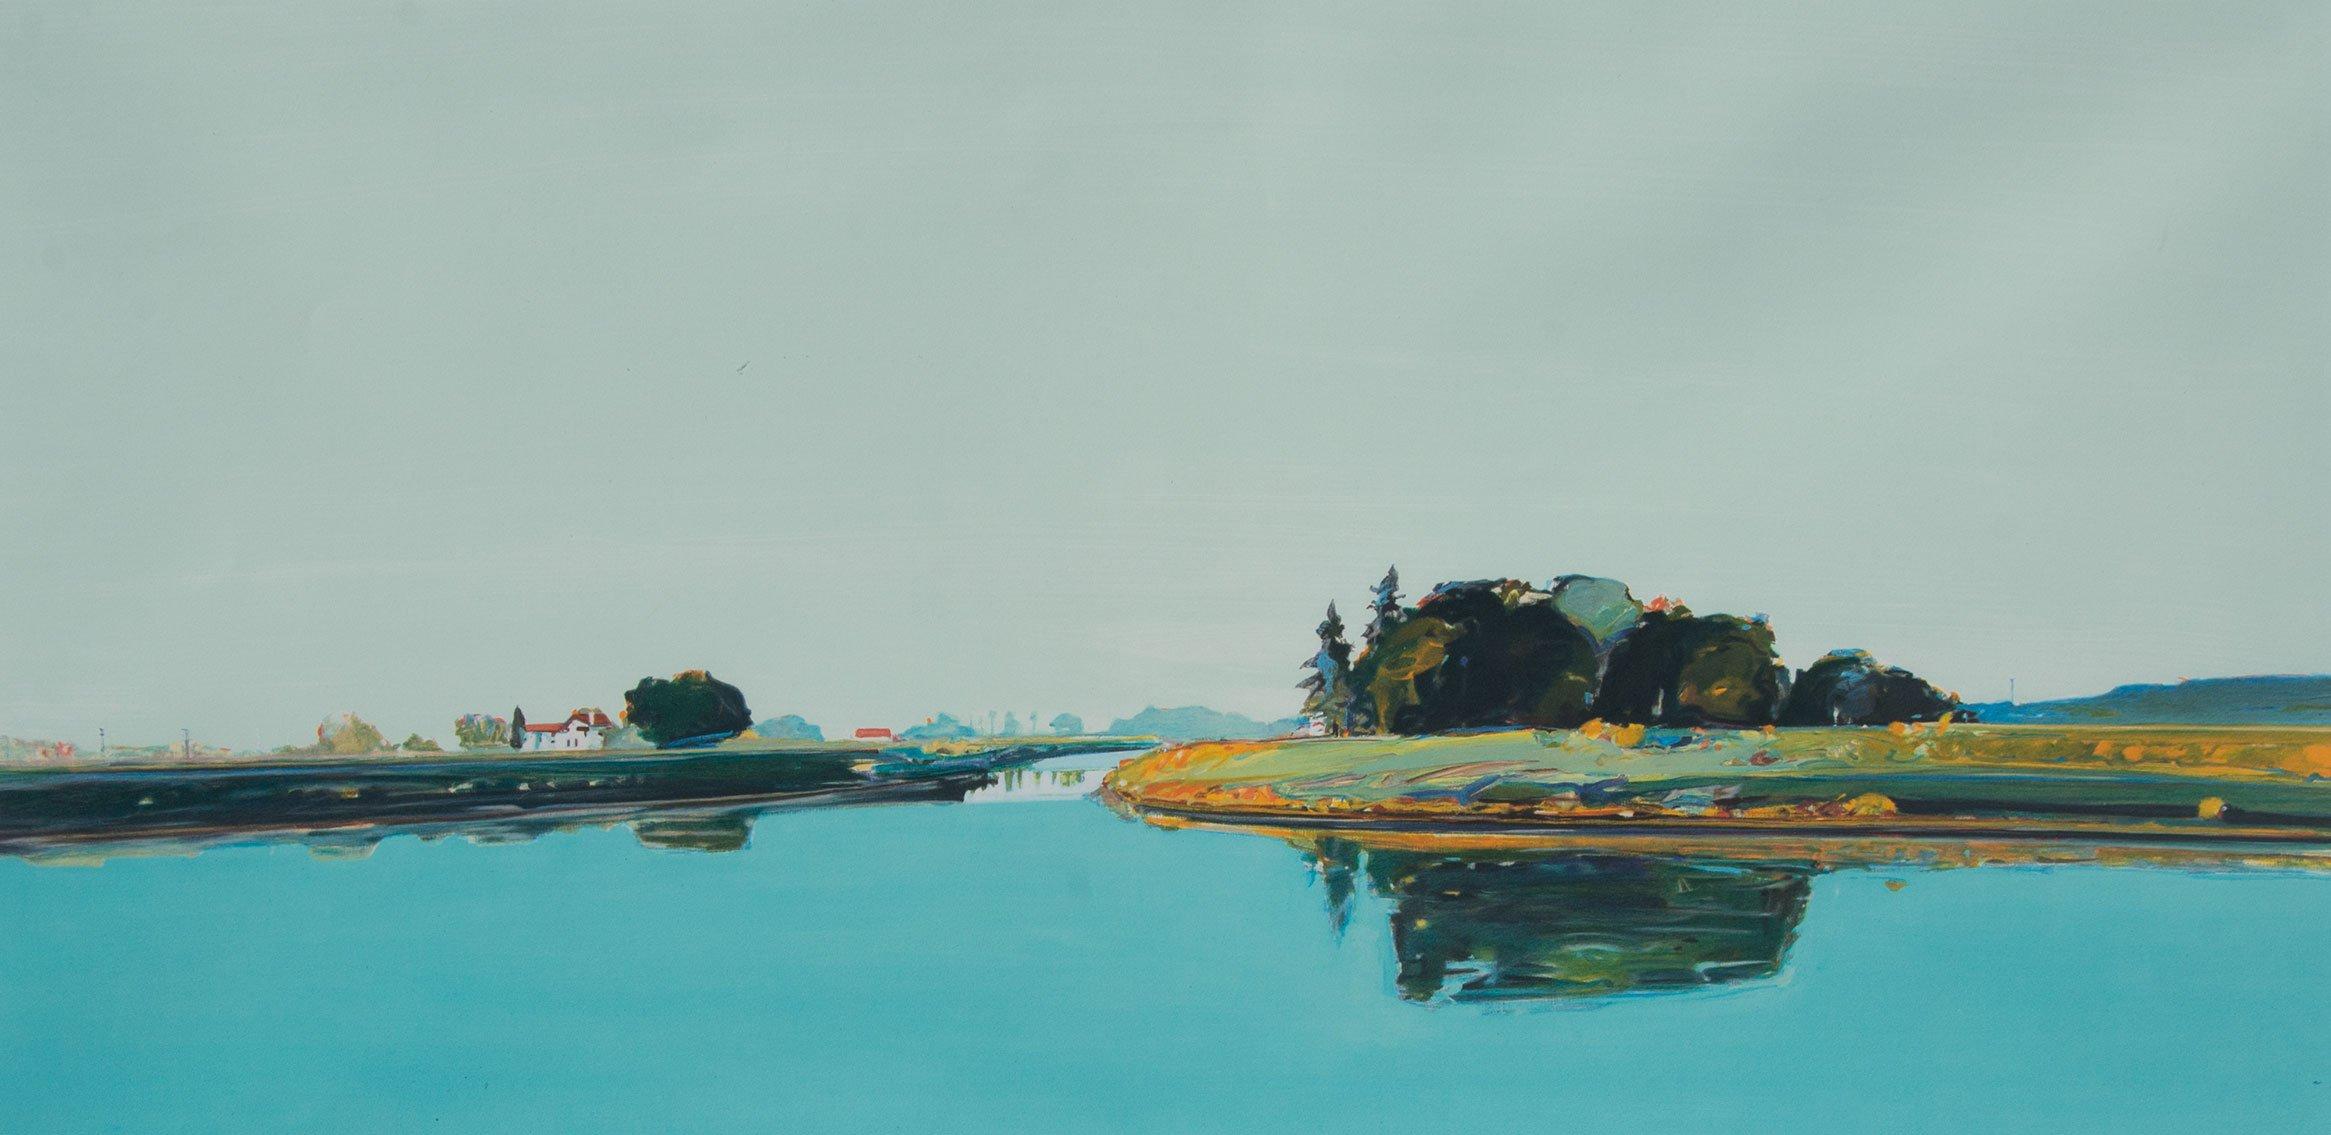 Gregory Kondos, River View 76/100, 1990